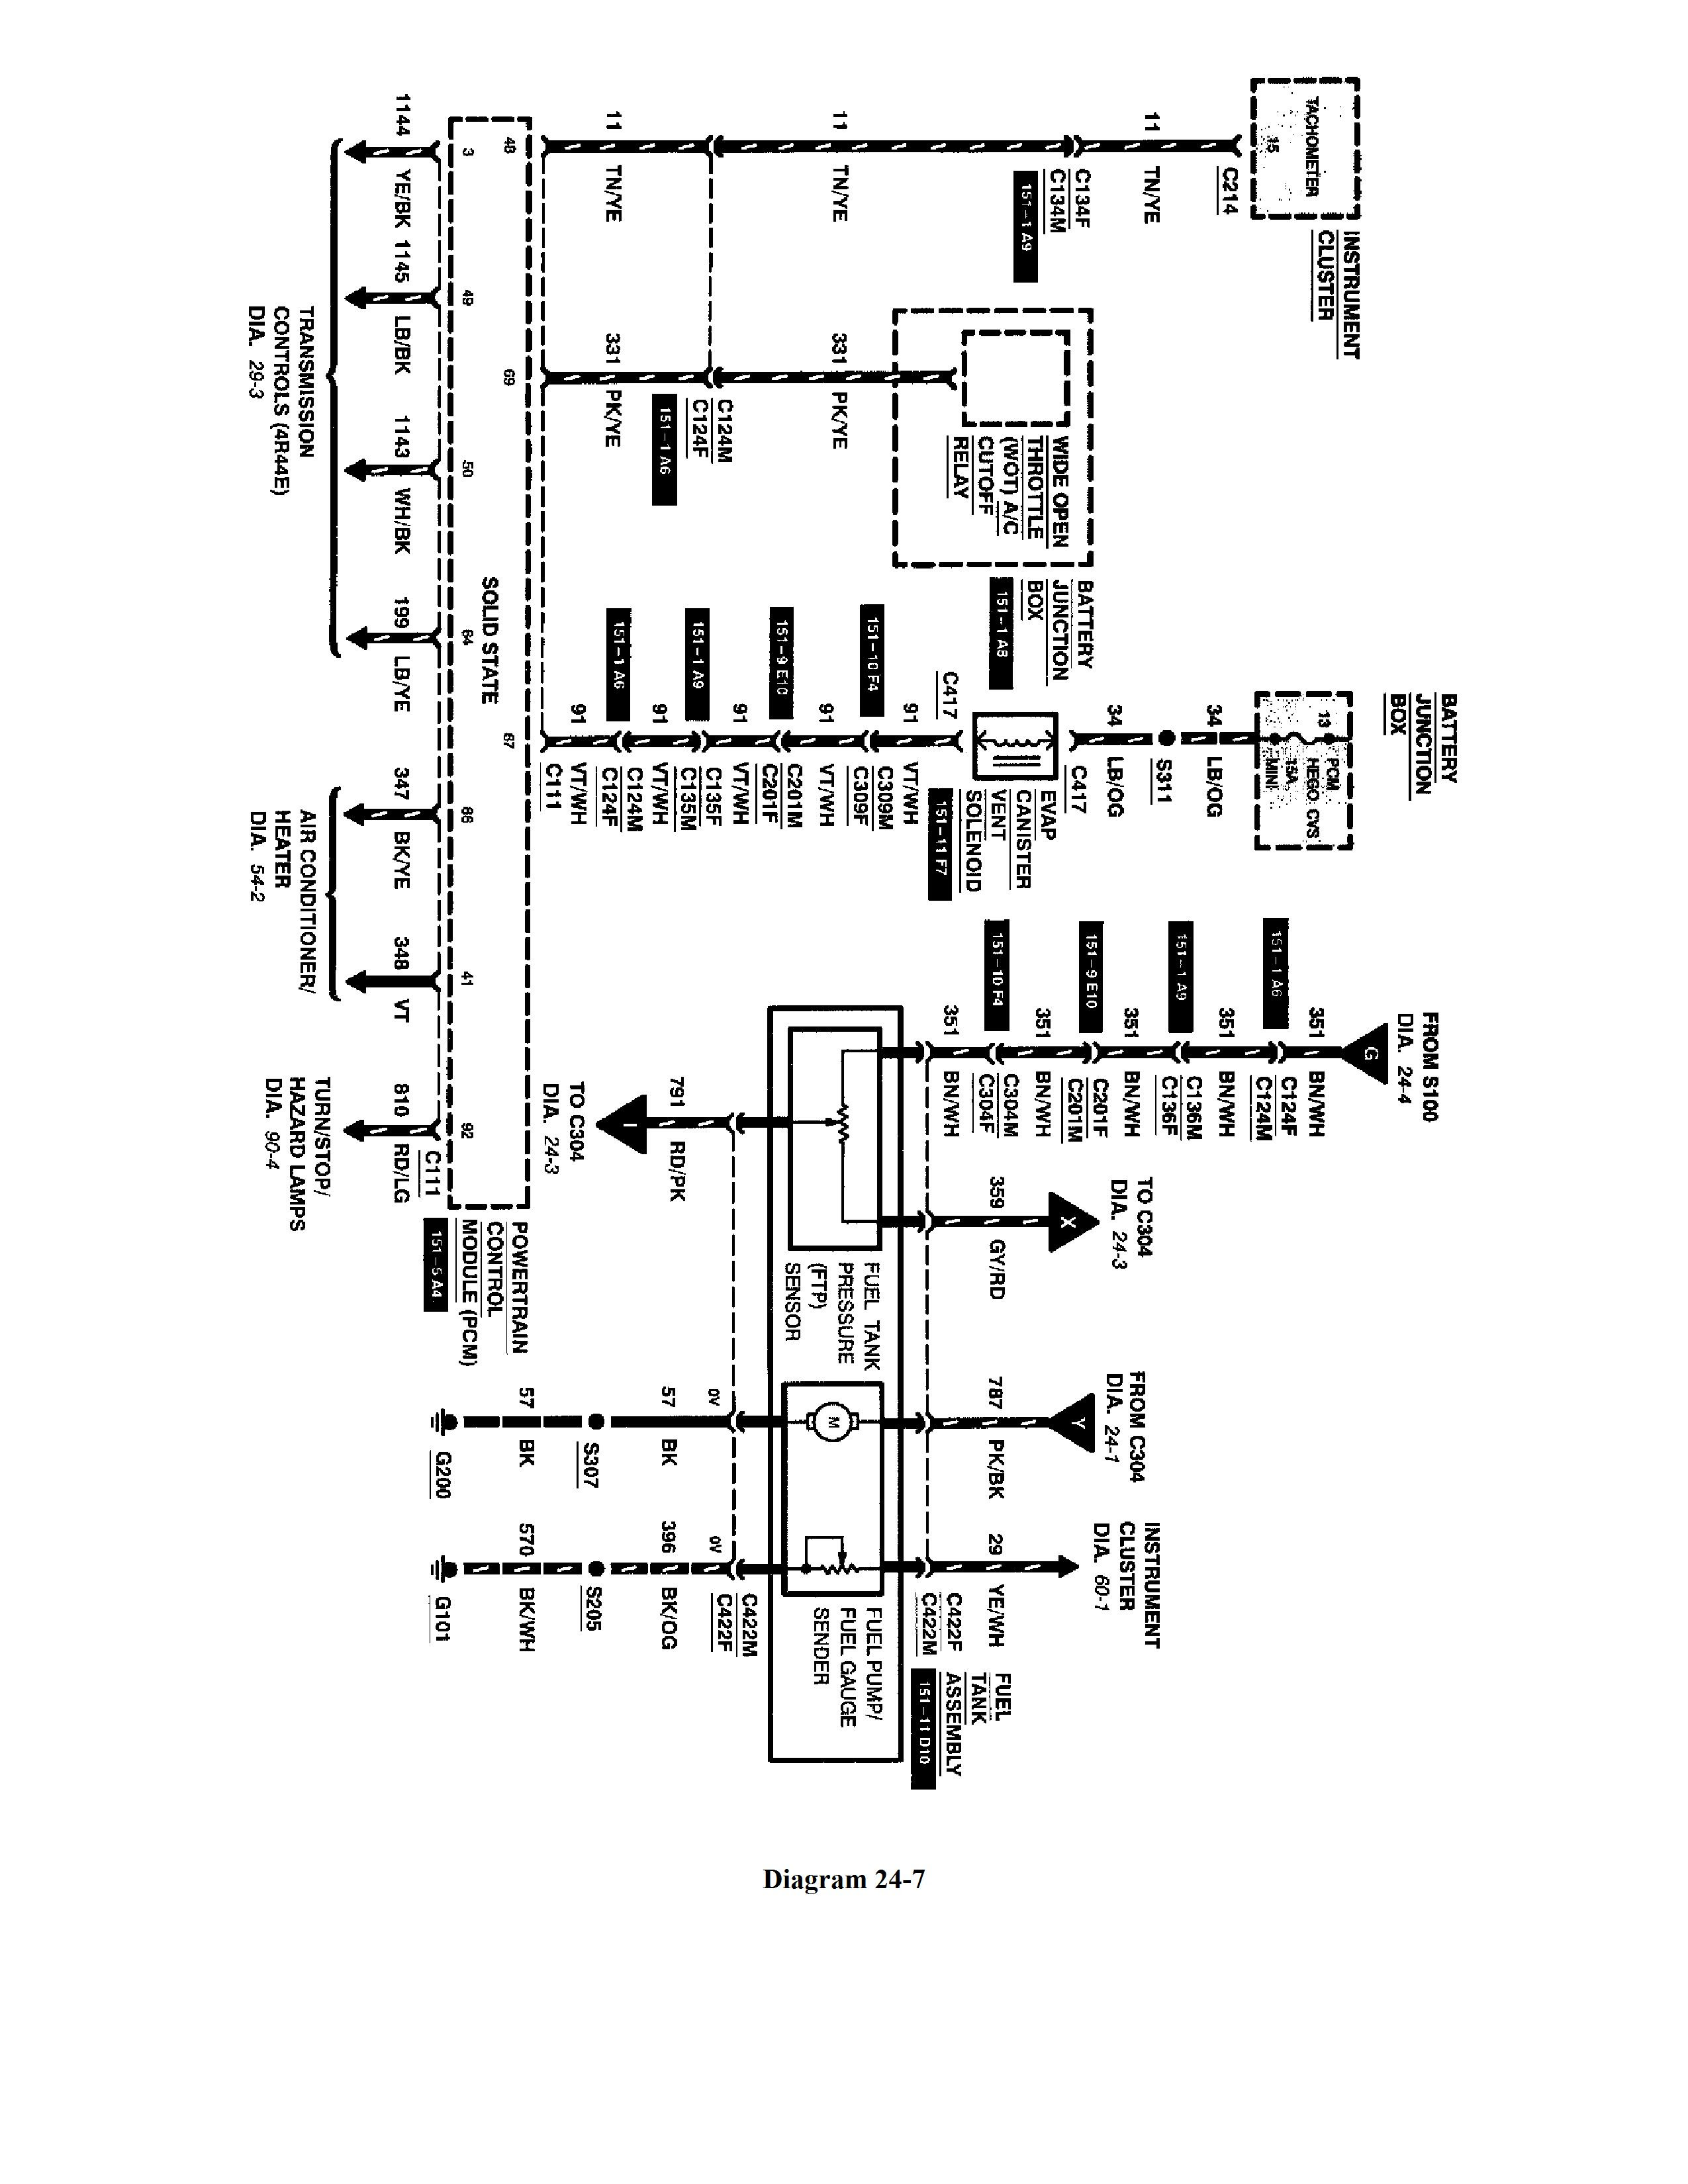 Wiring Diagram: 28 99 Ford Ranger Fuse Diagram